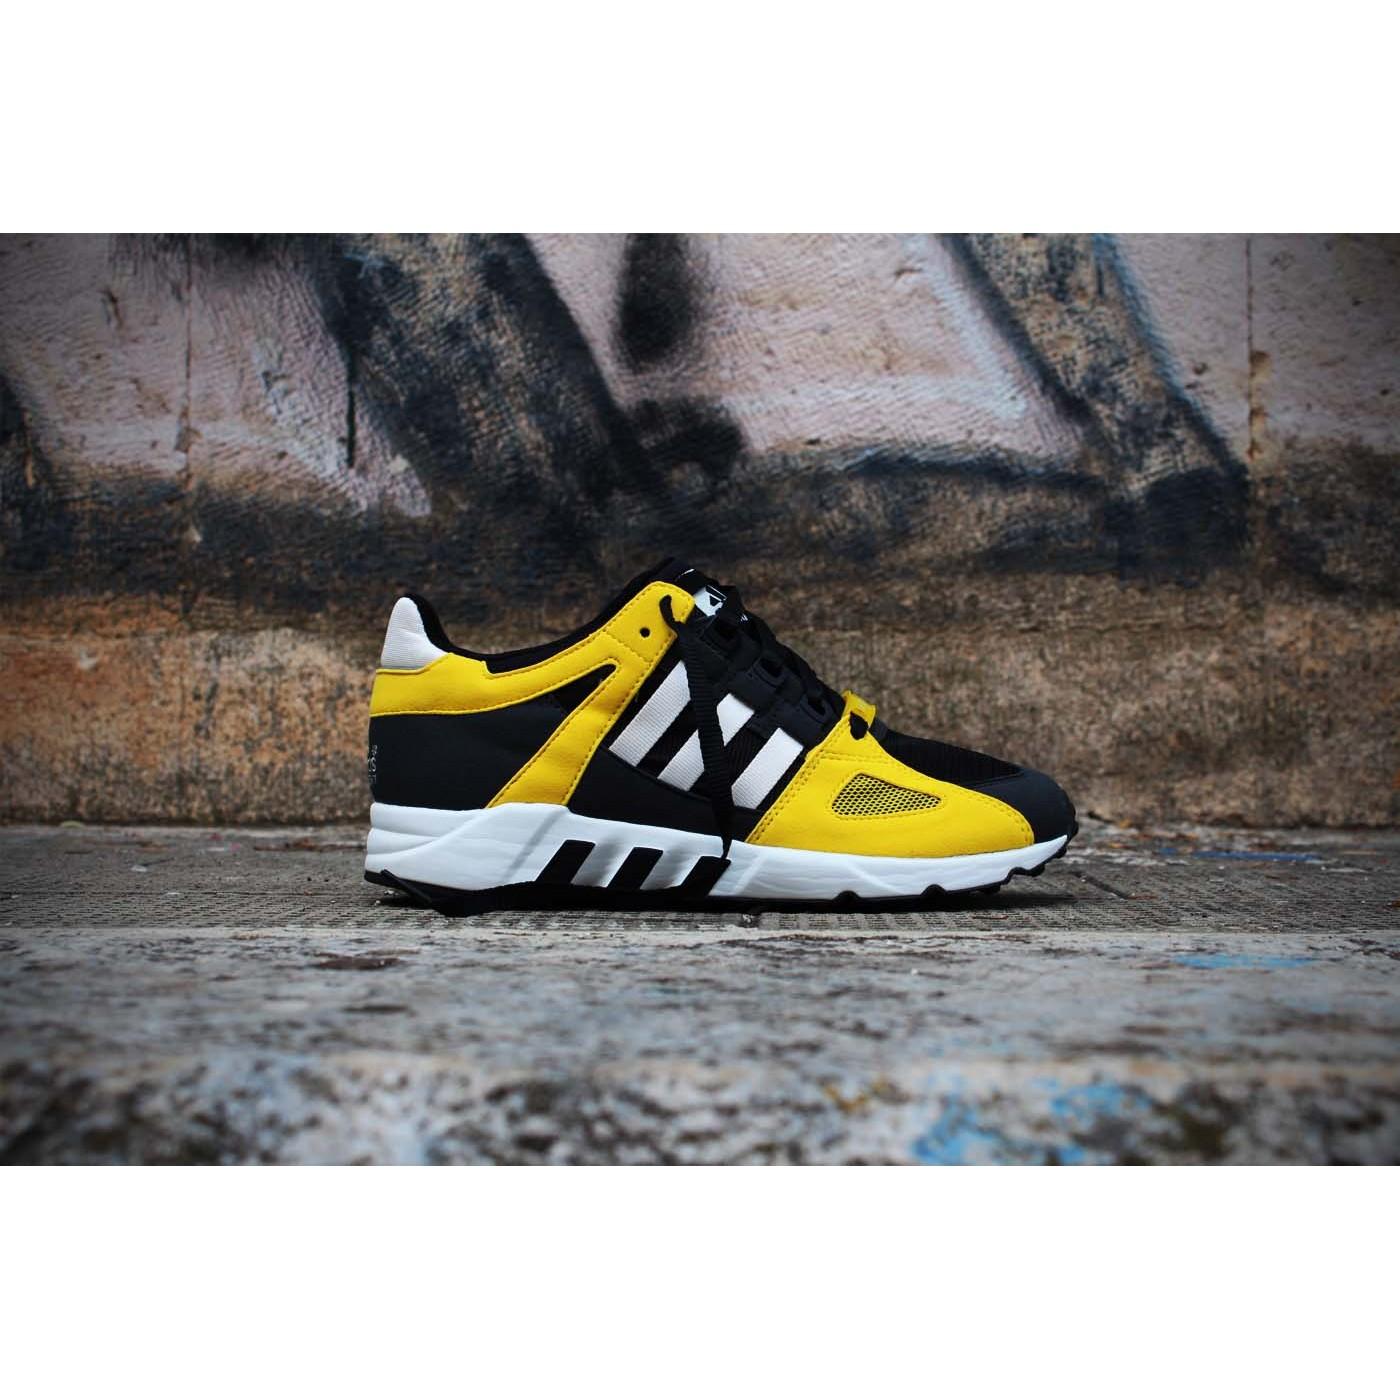 promo code e8d71 d4b57 Adidas EQT Guidance 93 Retro Black Sun Yellow